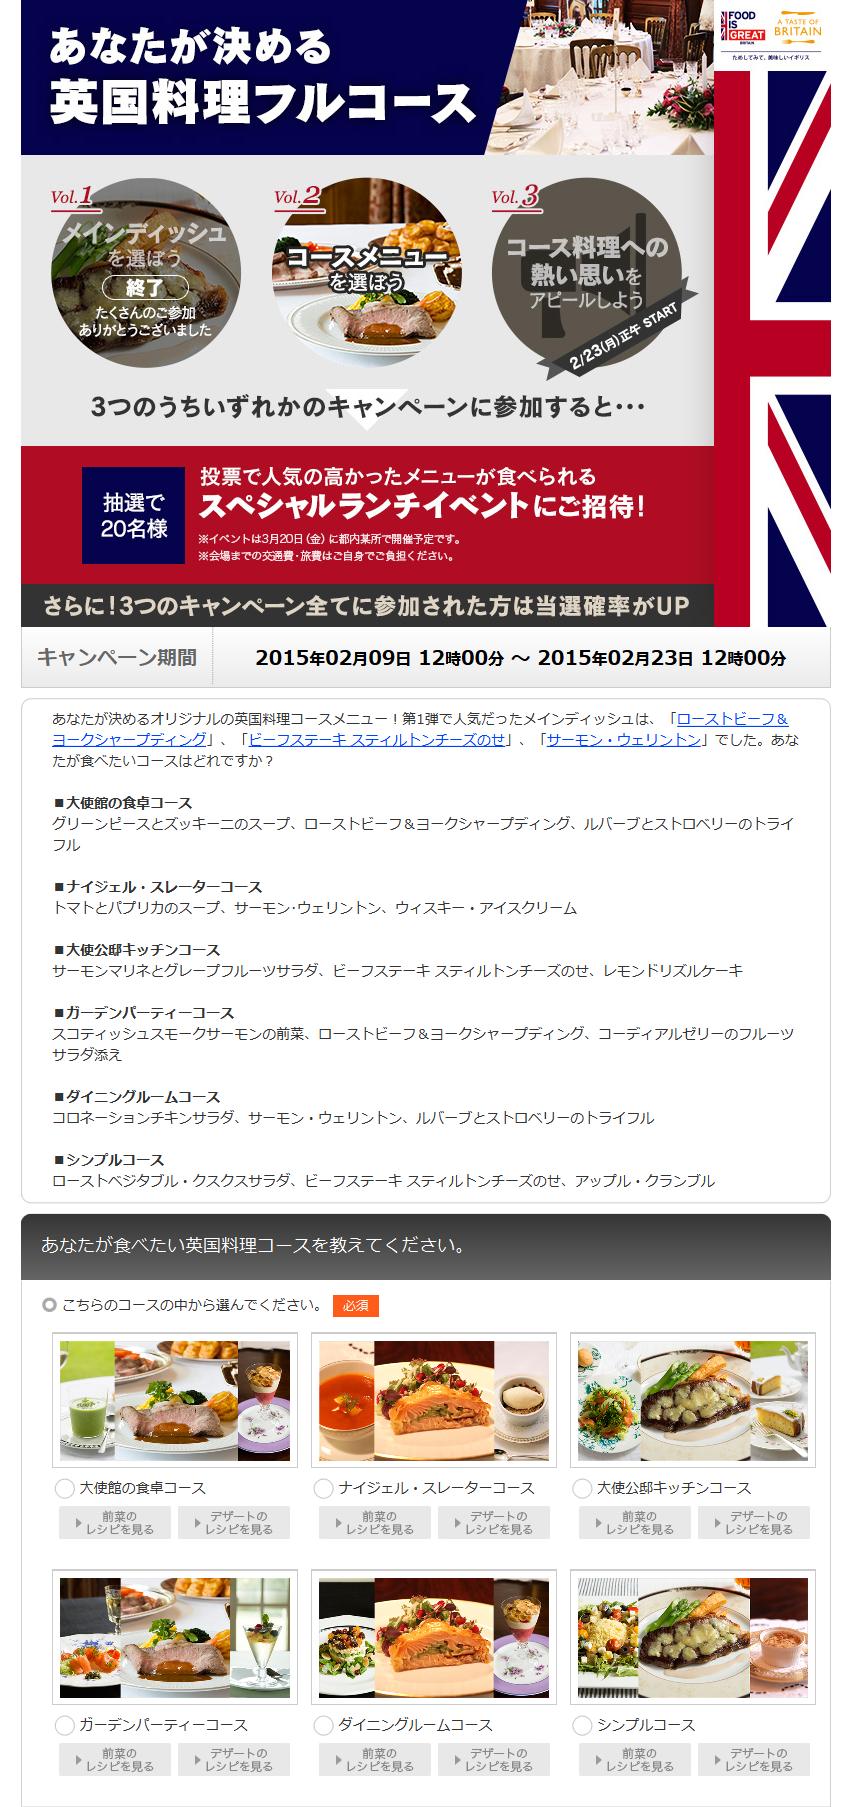 A_Taste_of_Britain_20150209